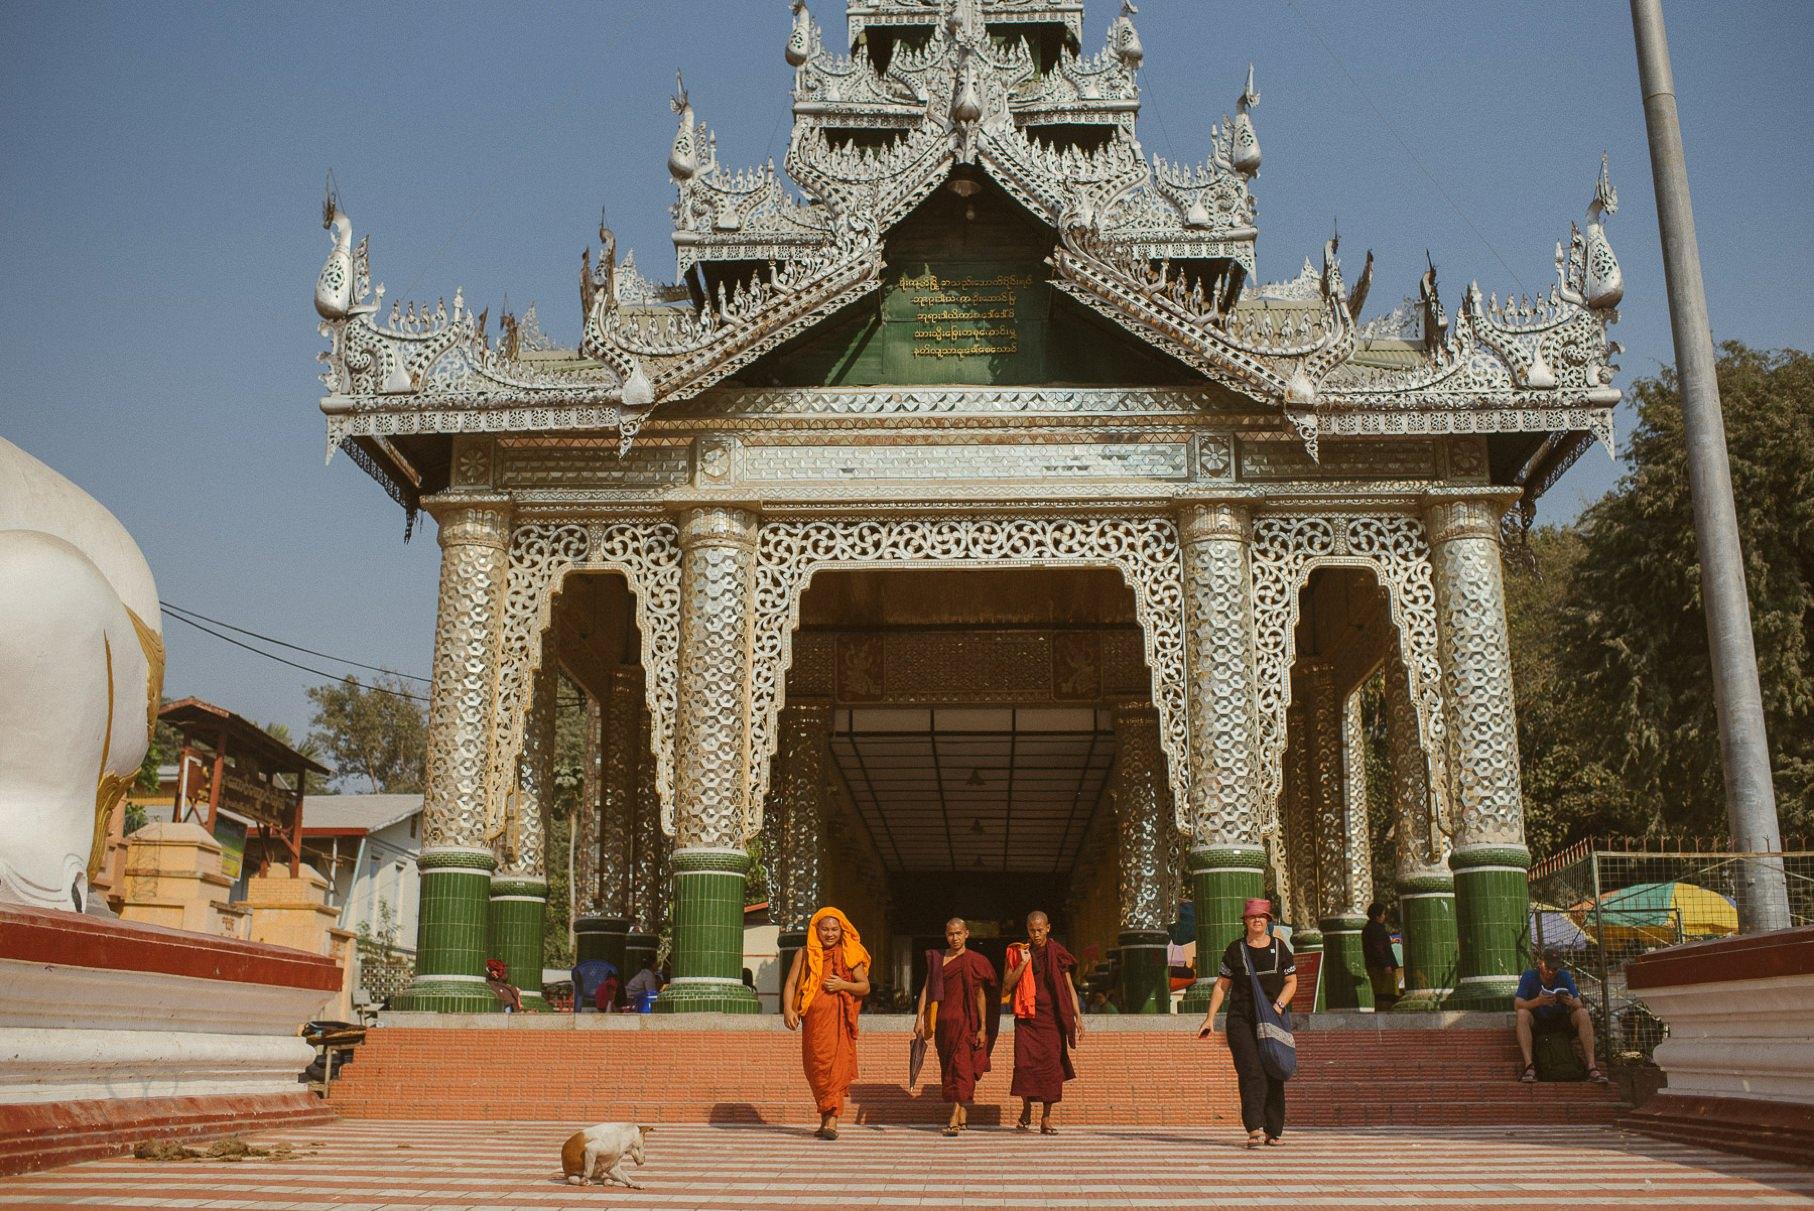 0055 yangon mandalay d76 6912 - Großstädte Myanmars - Yangon & Mandalay